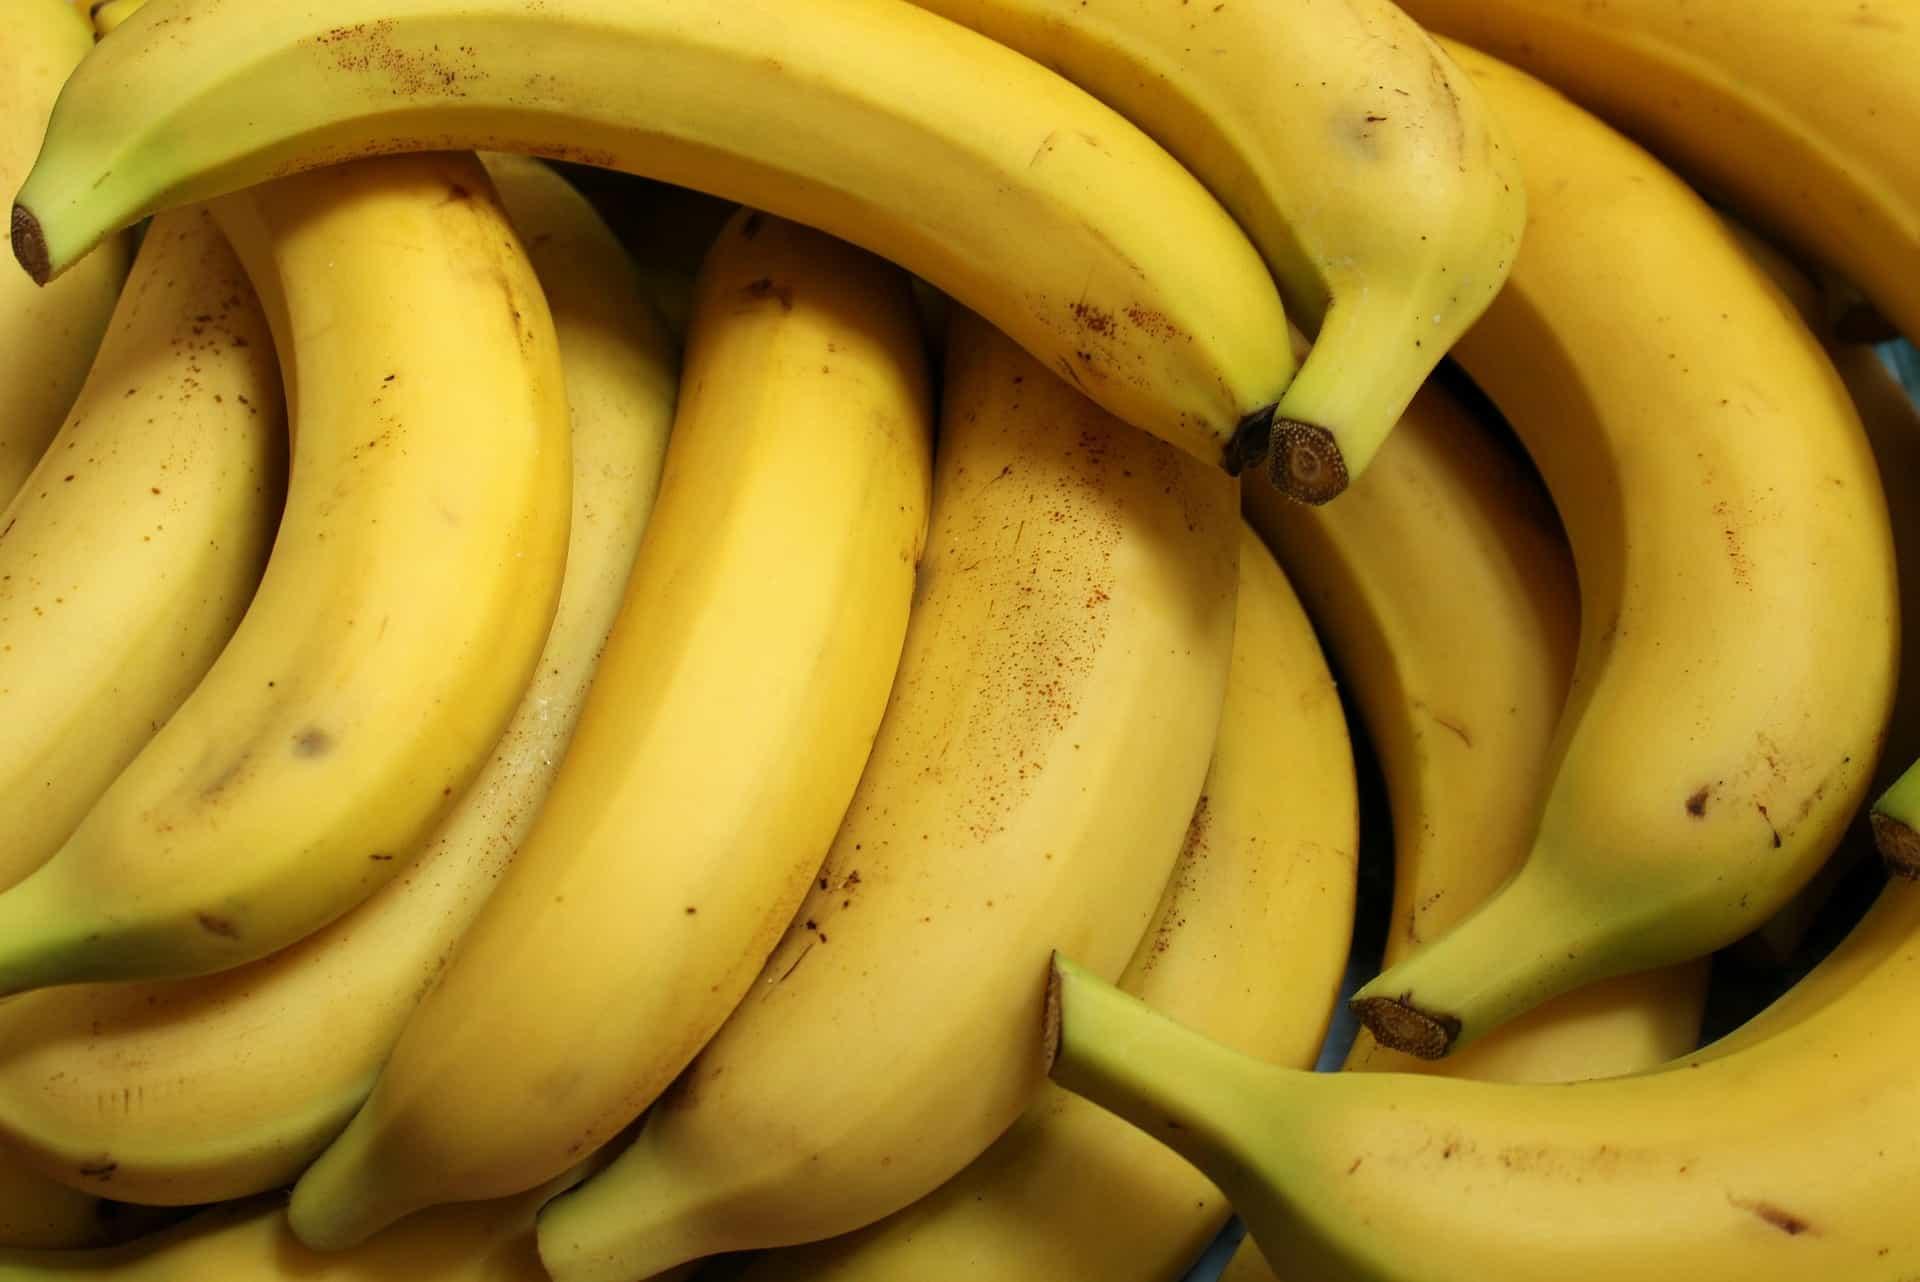 Banane | Valori Nutrizionali e Benefici